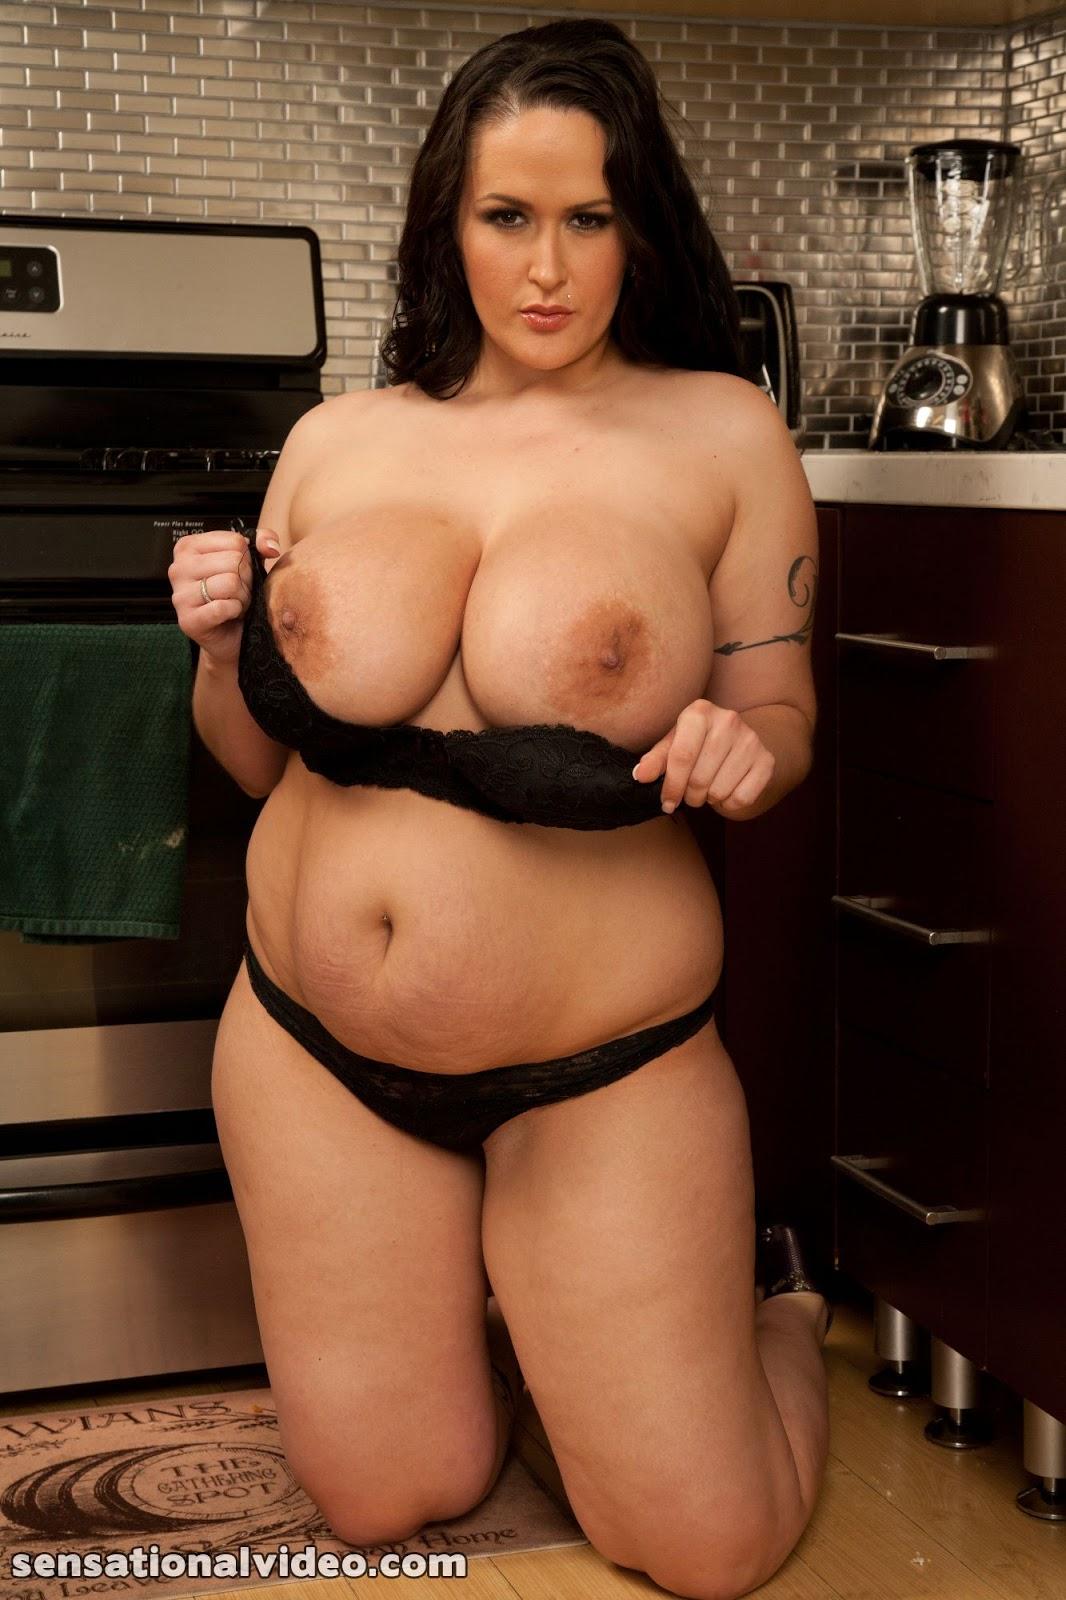 amanda peterson naked